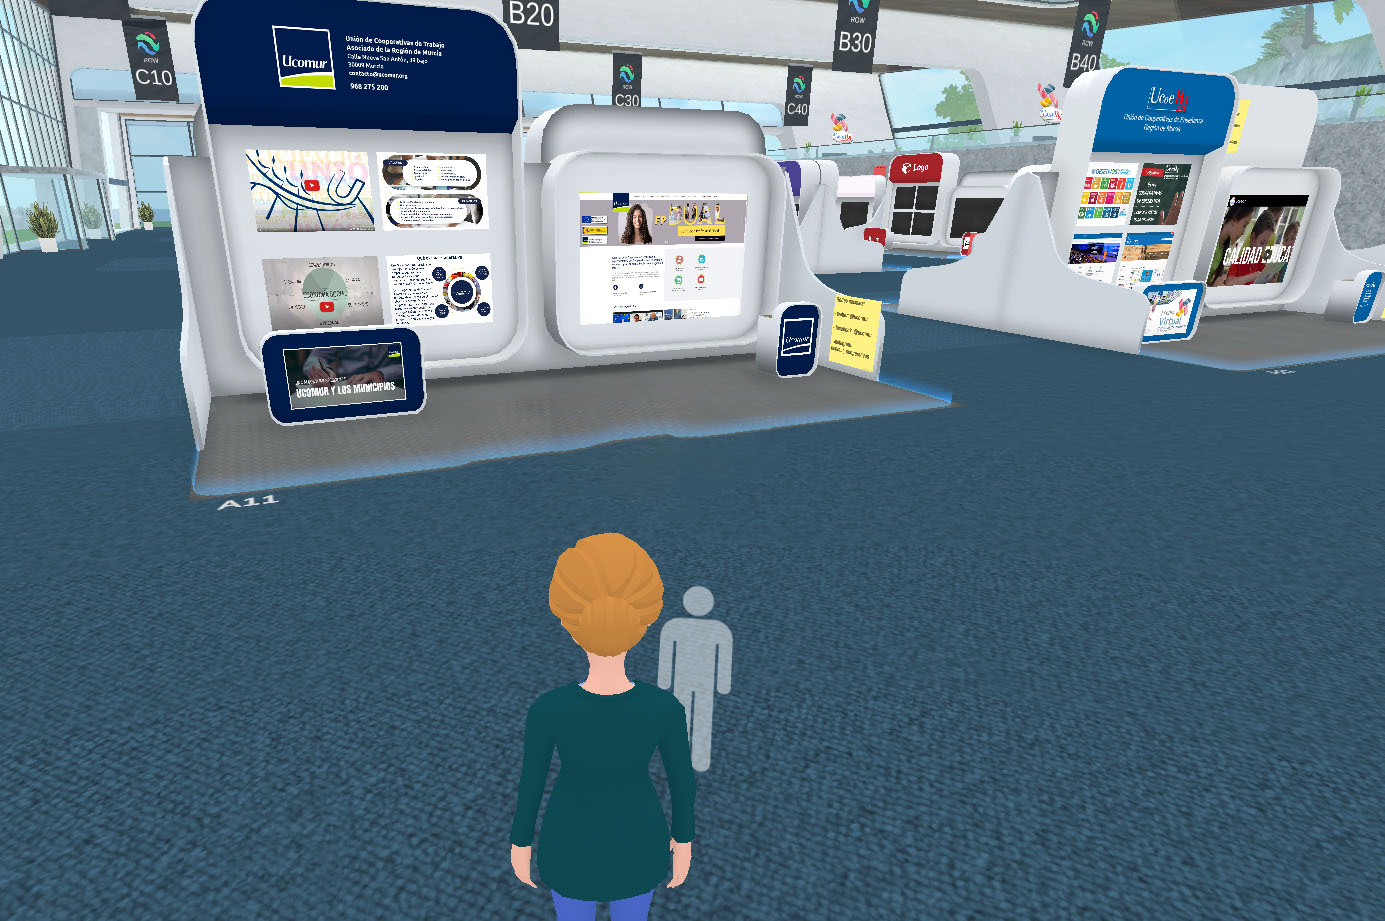 Ucomur Participa en la 1ª Feria Virtual de Cooperativas de Enseñanza en España